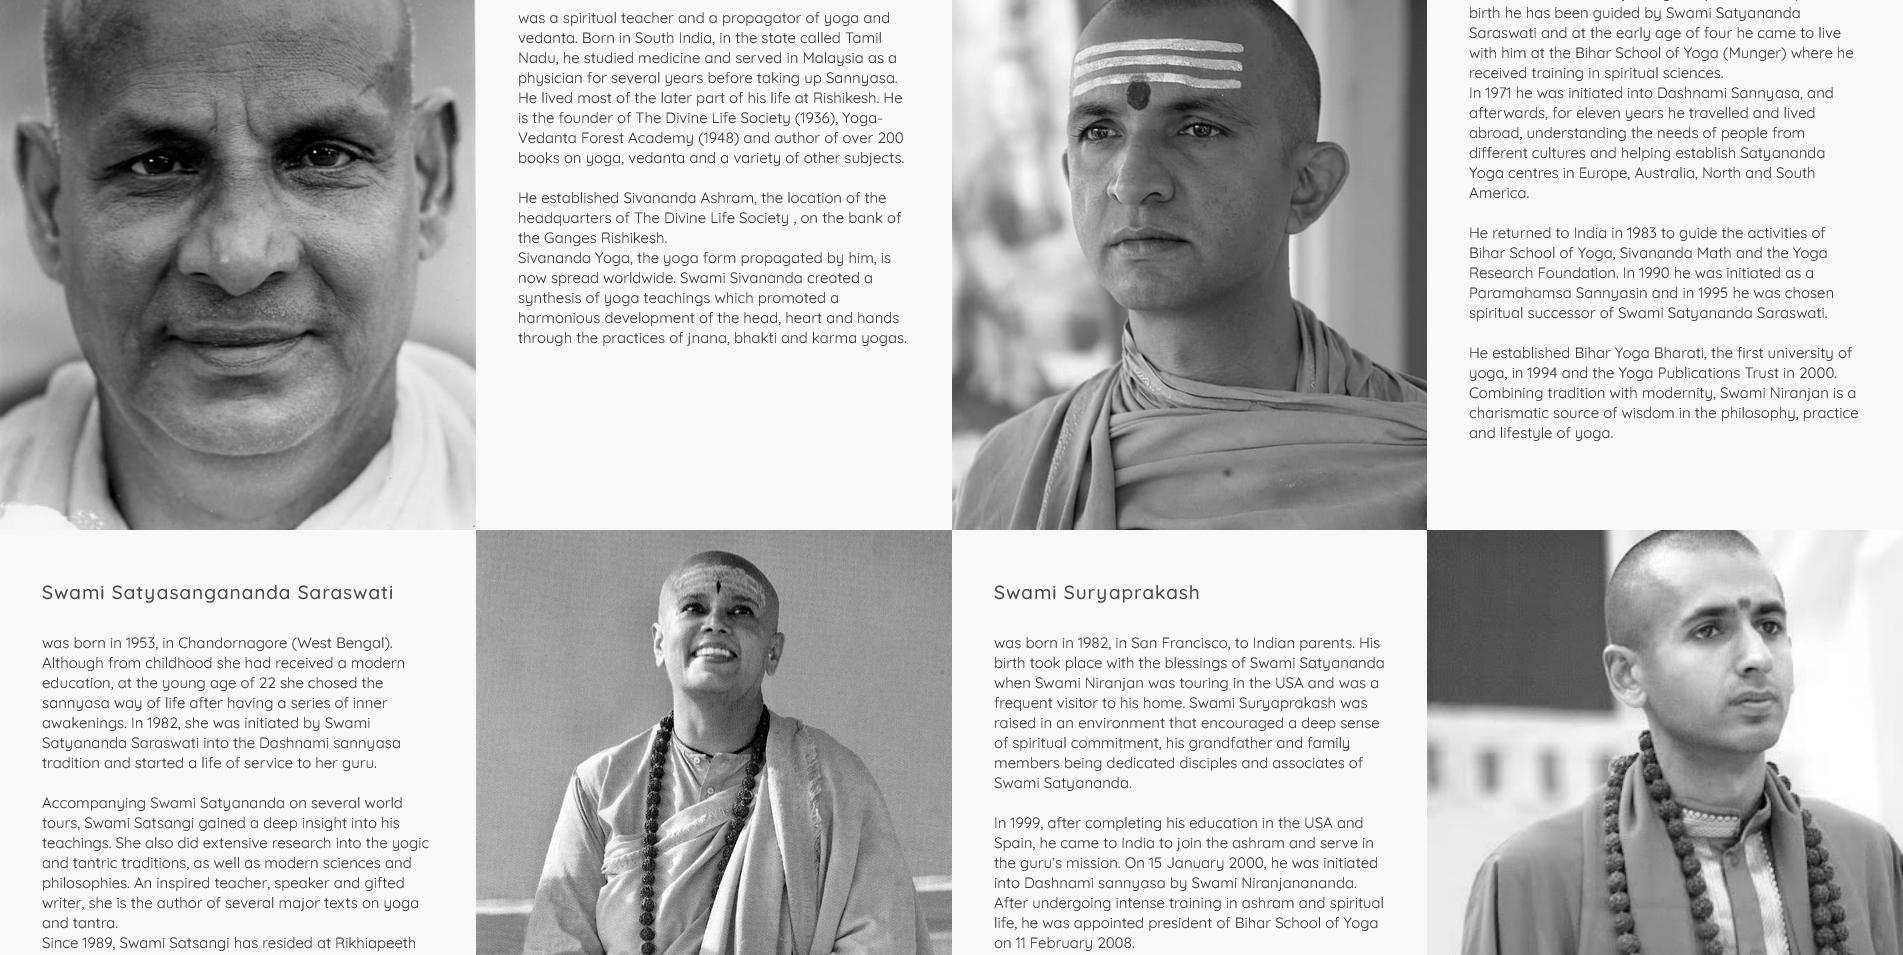 History and teachers Satyananda Yoga 2